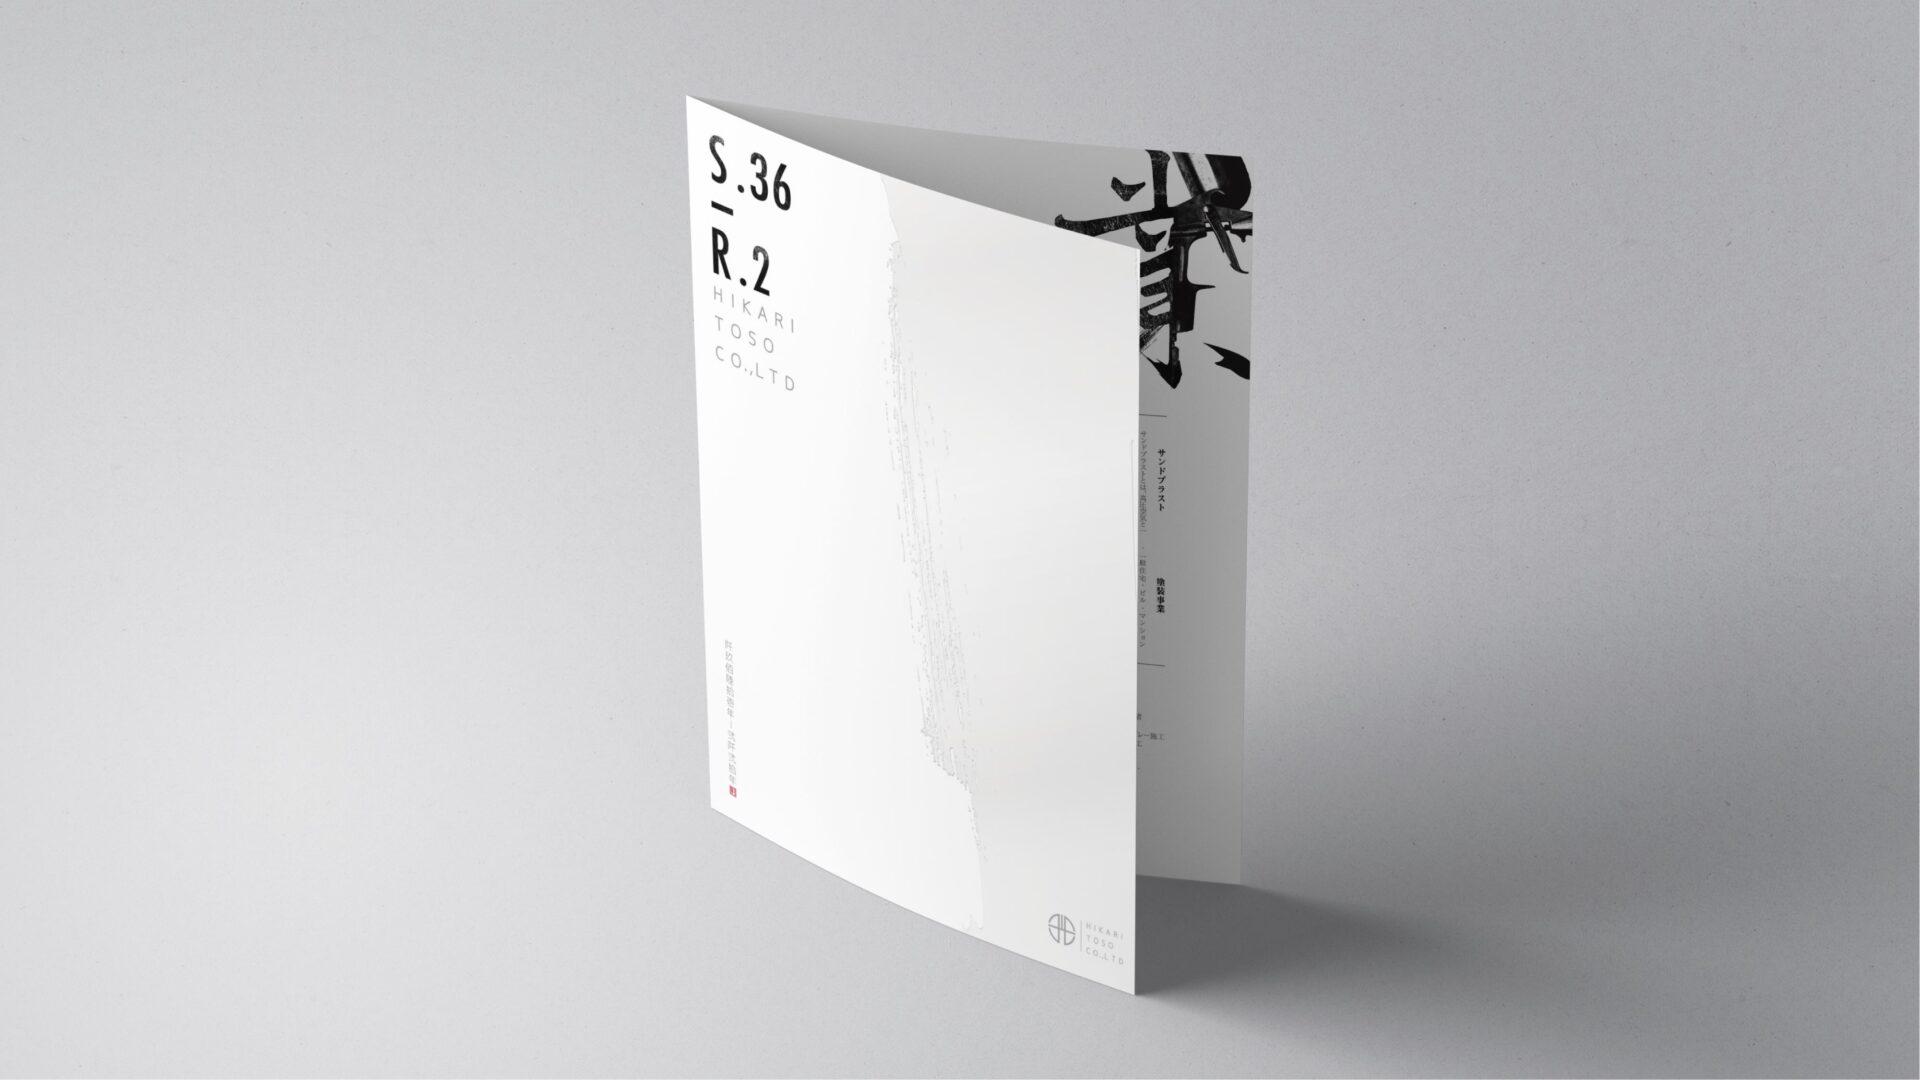 「HIKARITOSO CO .,LTD」のサムネイル画像